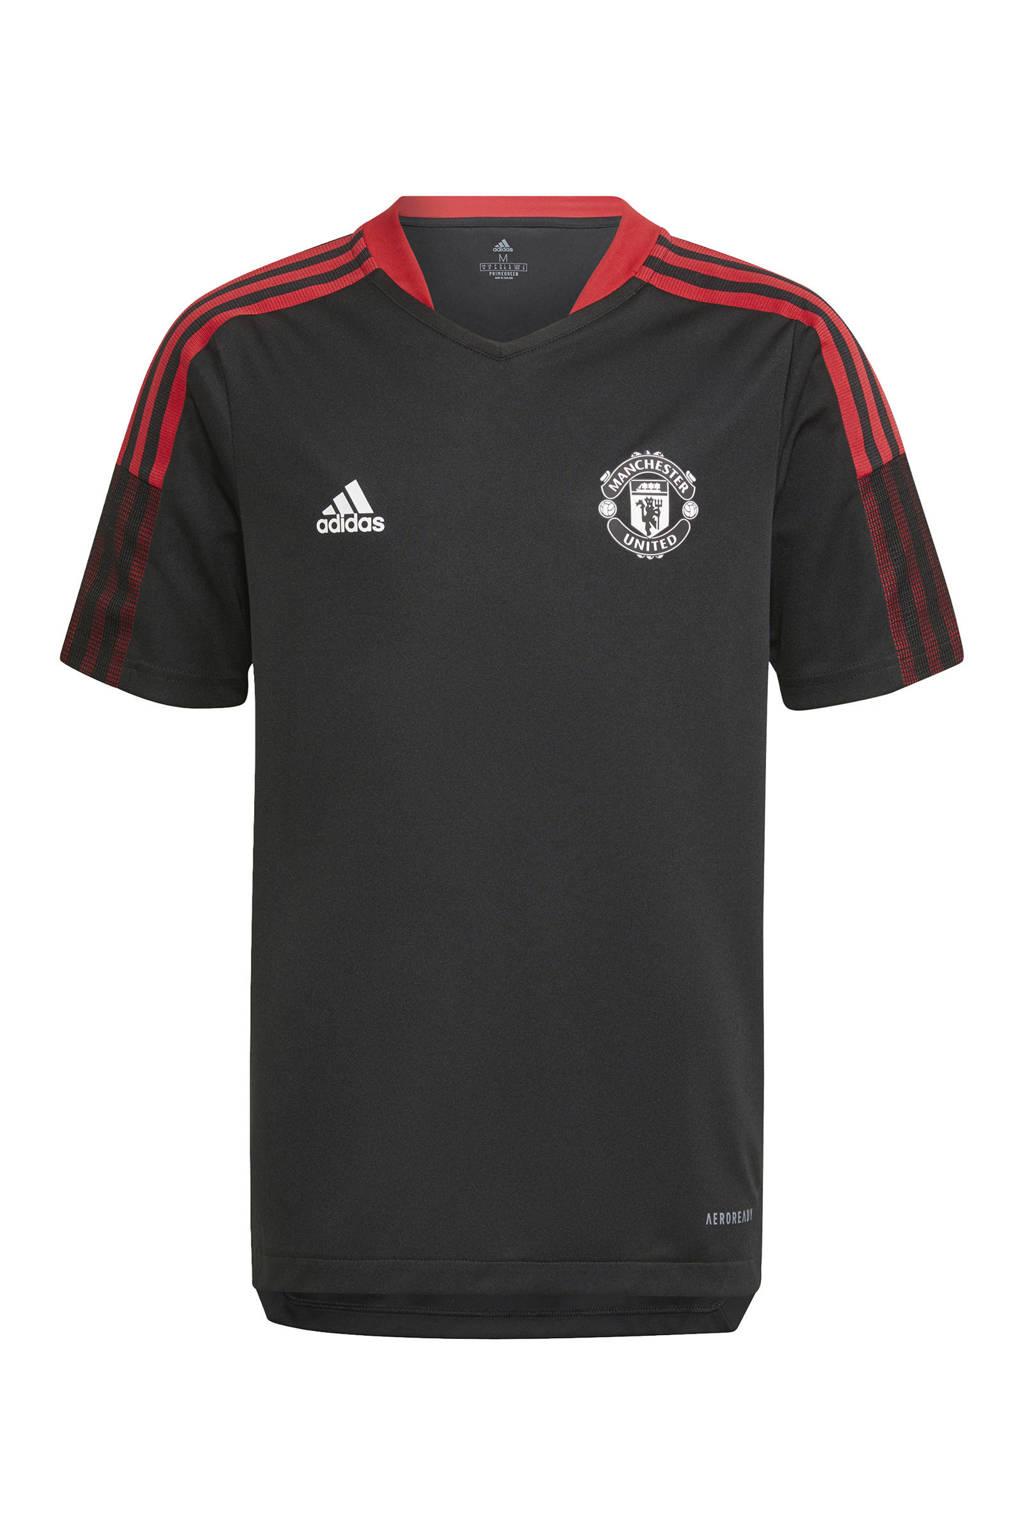 adidas Performance Junior Manchester United voetbalshirt training, Zwart